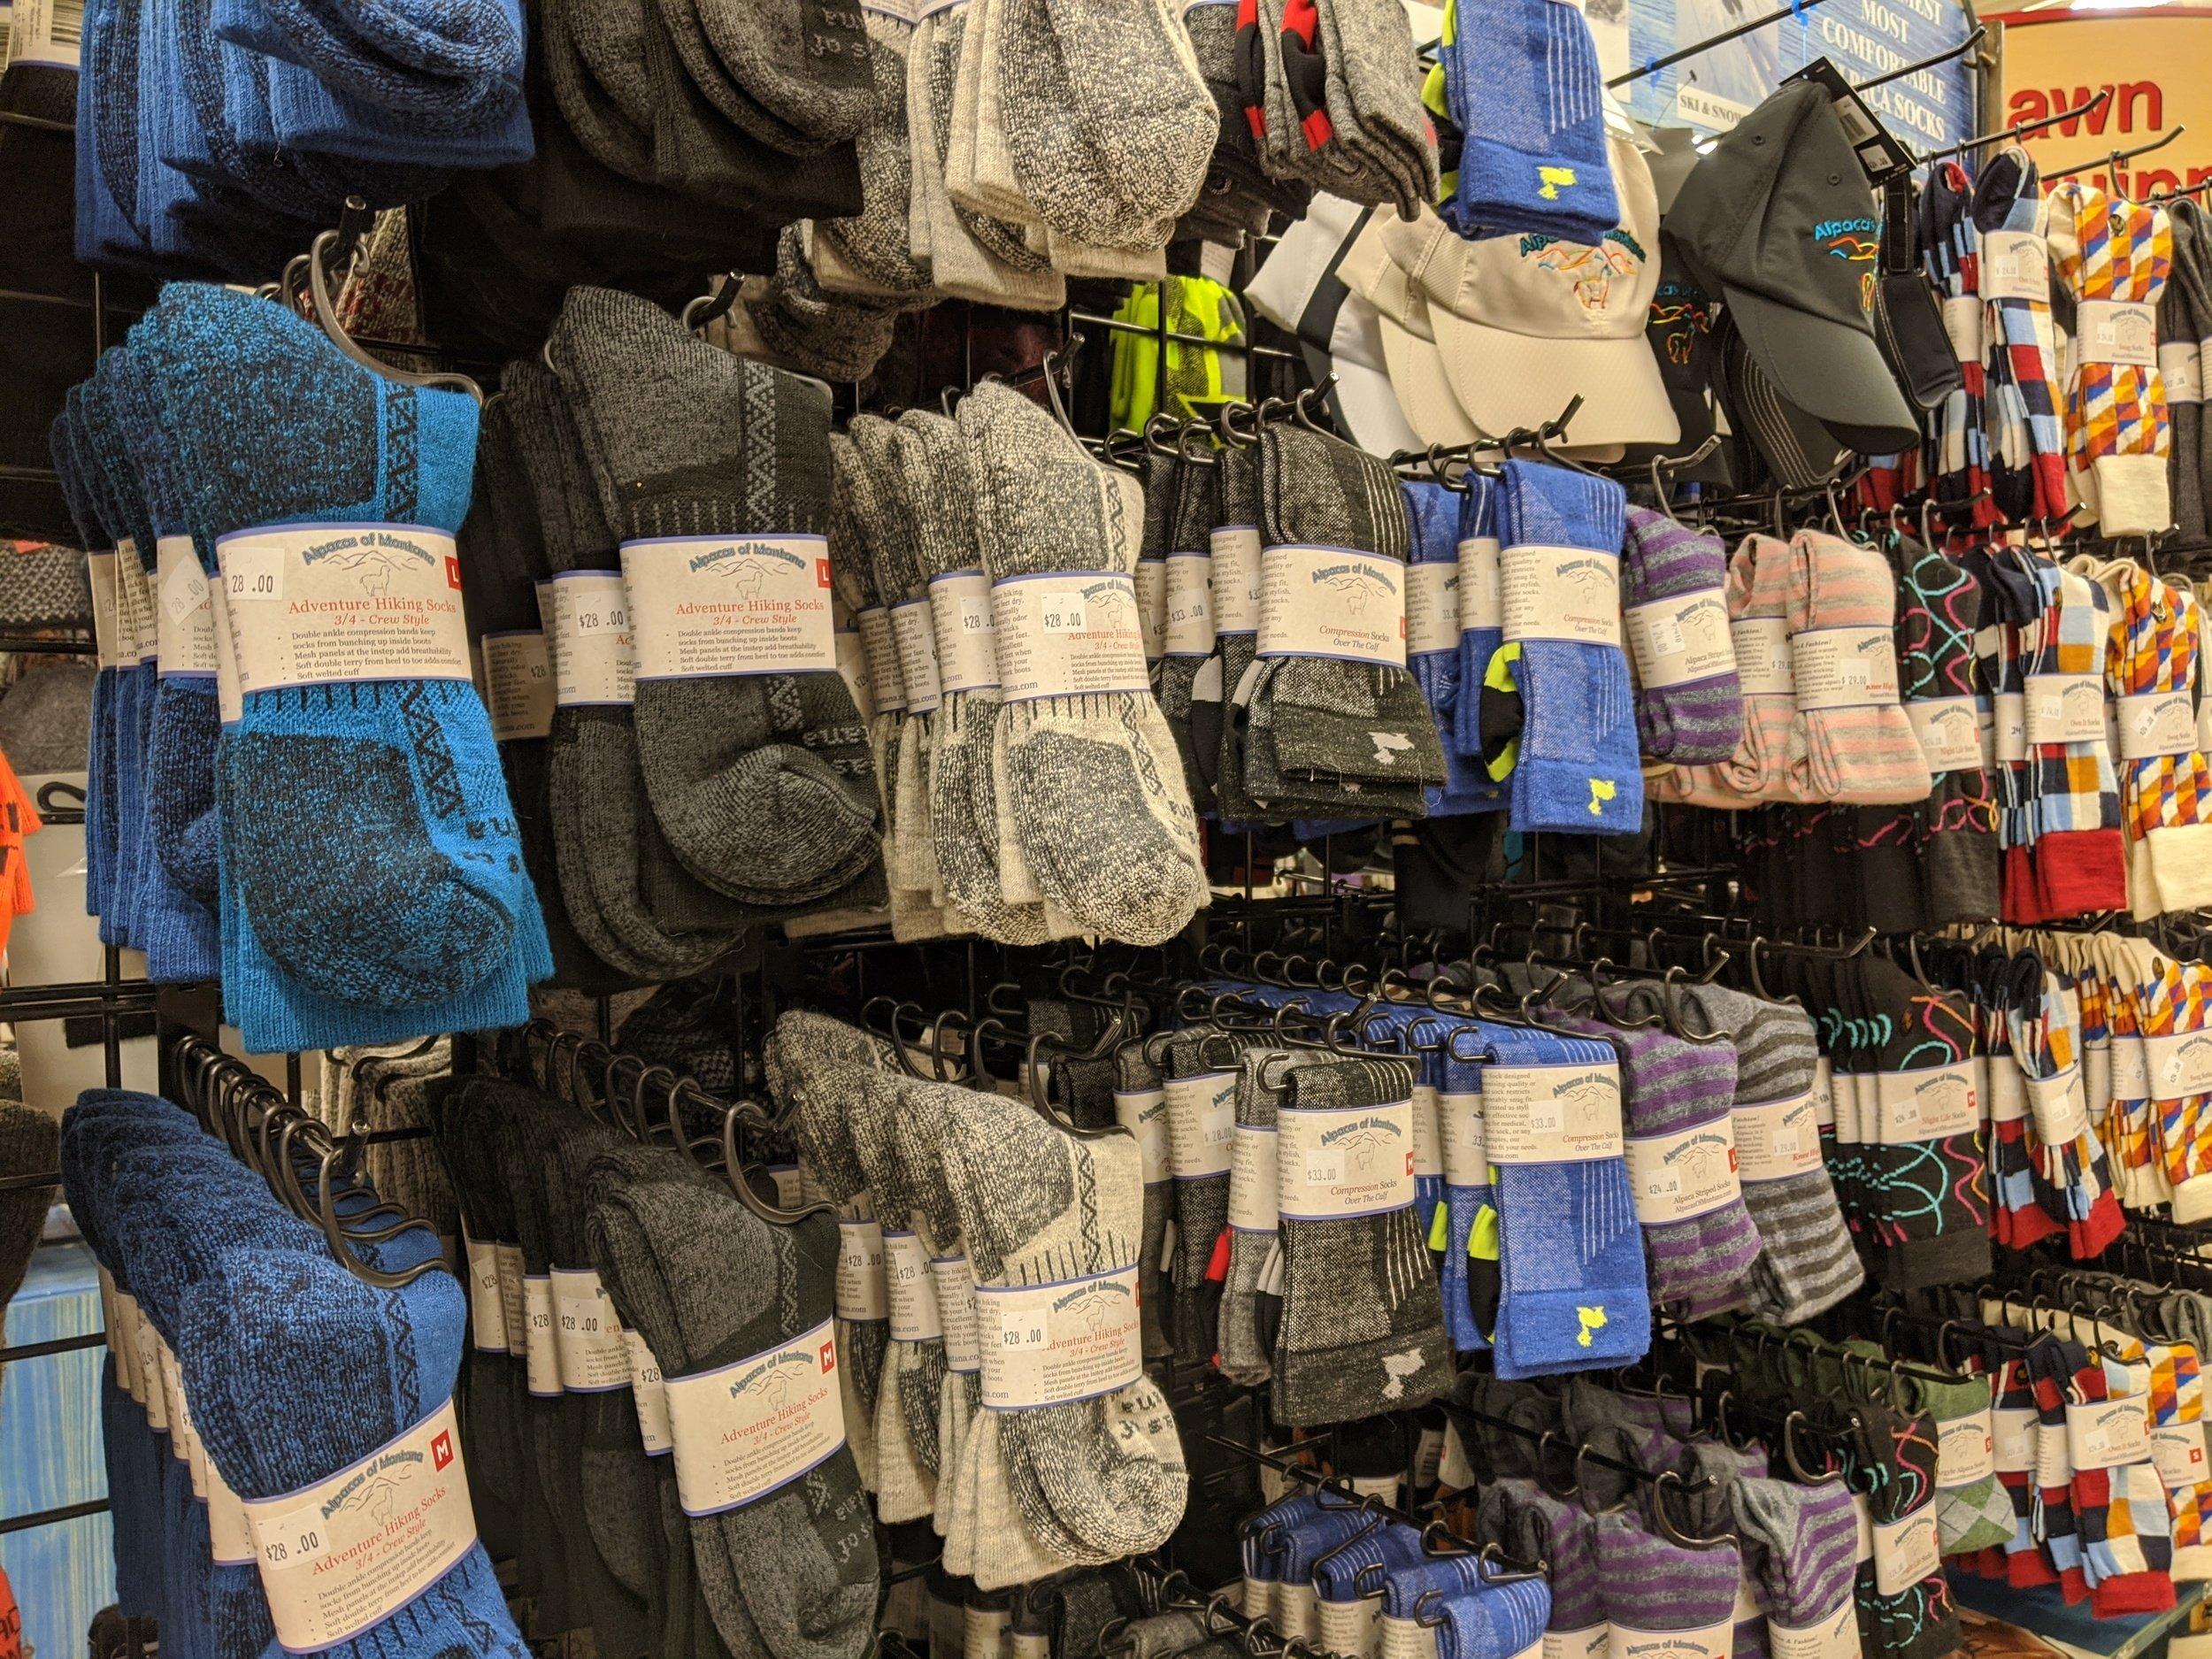 alpaca wool socks owenhouse ace hardware - Bozeman, Montana